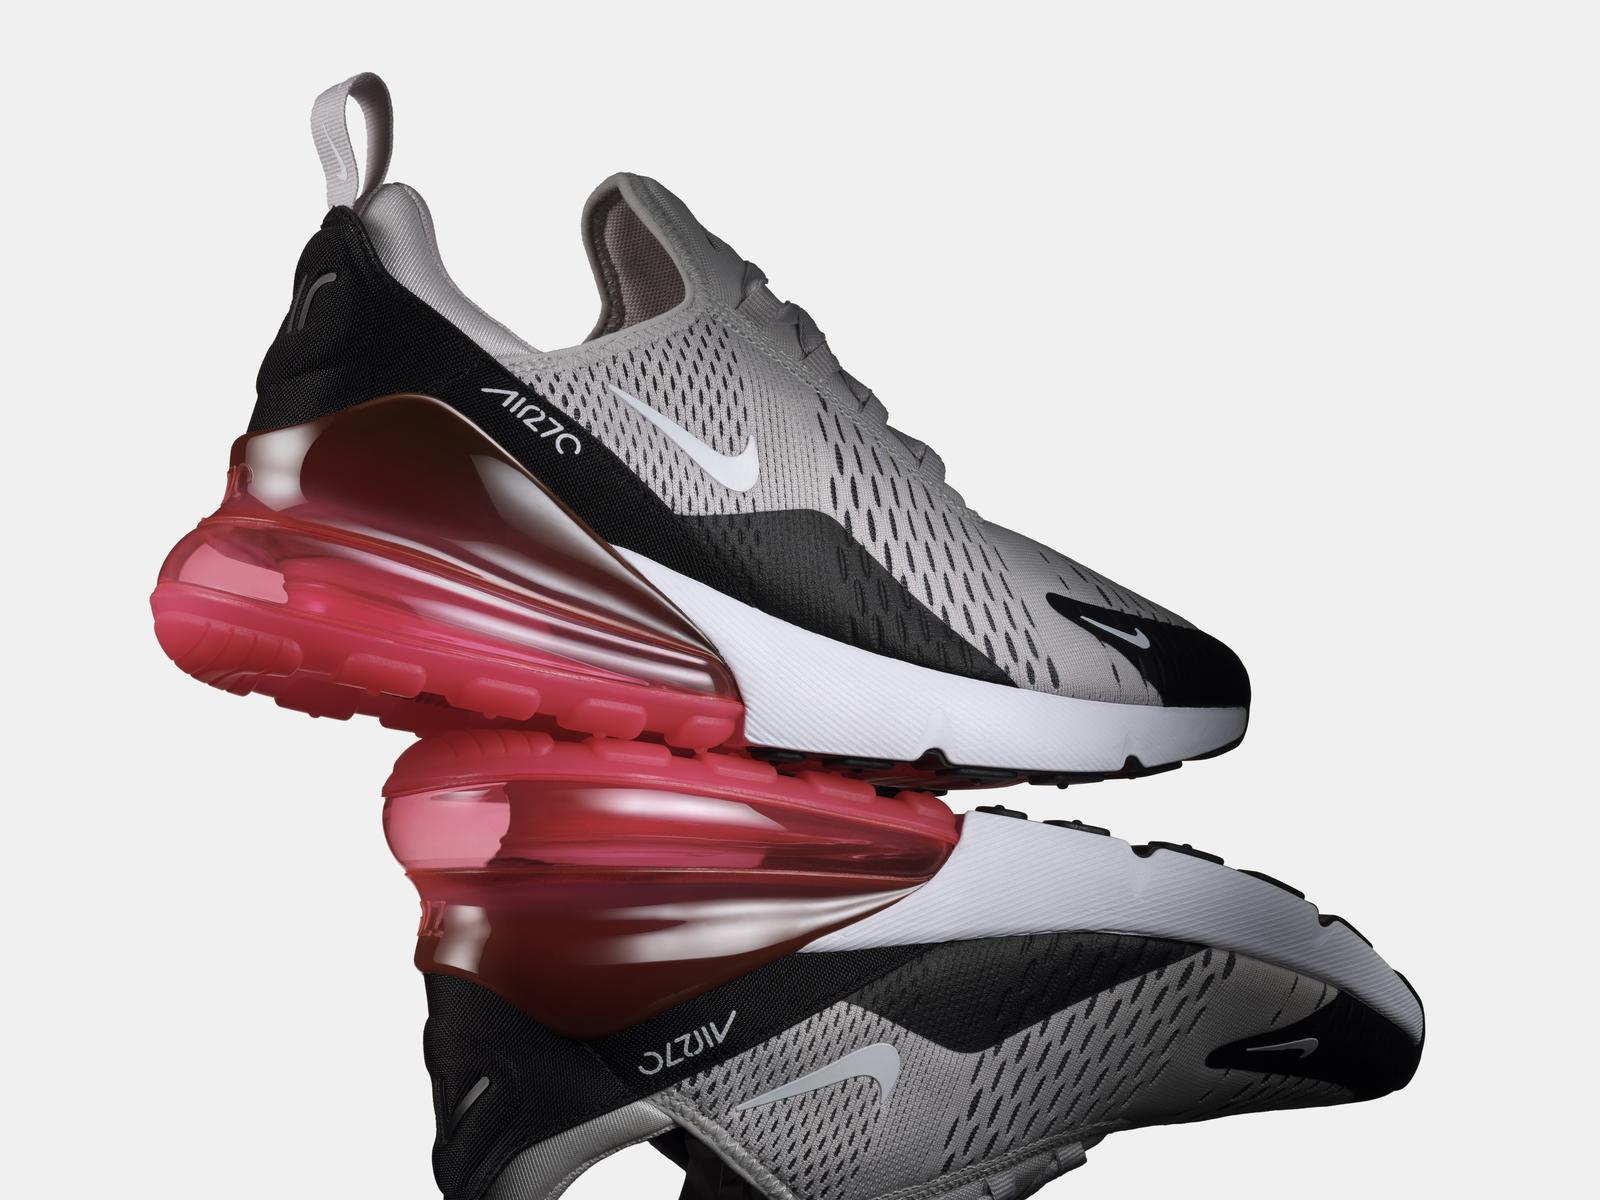 Nike_AM270_duo3_jpeg_native_1600.jpg